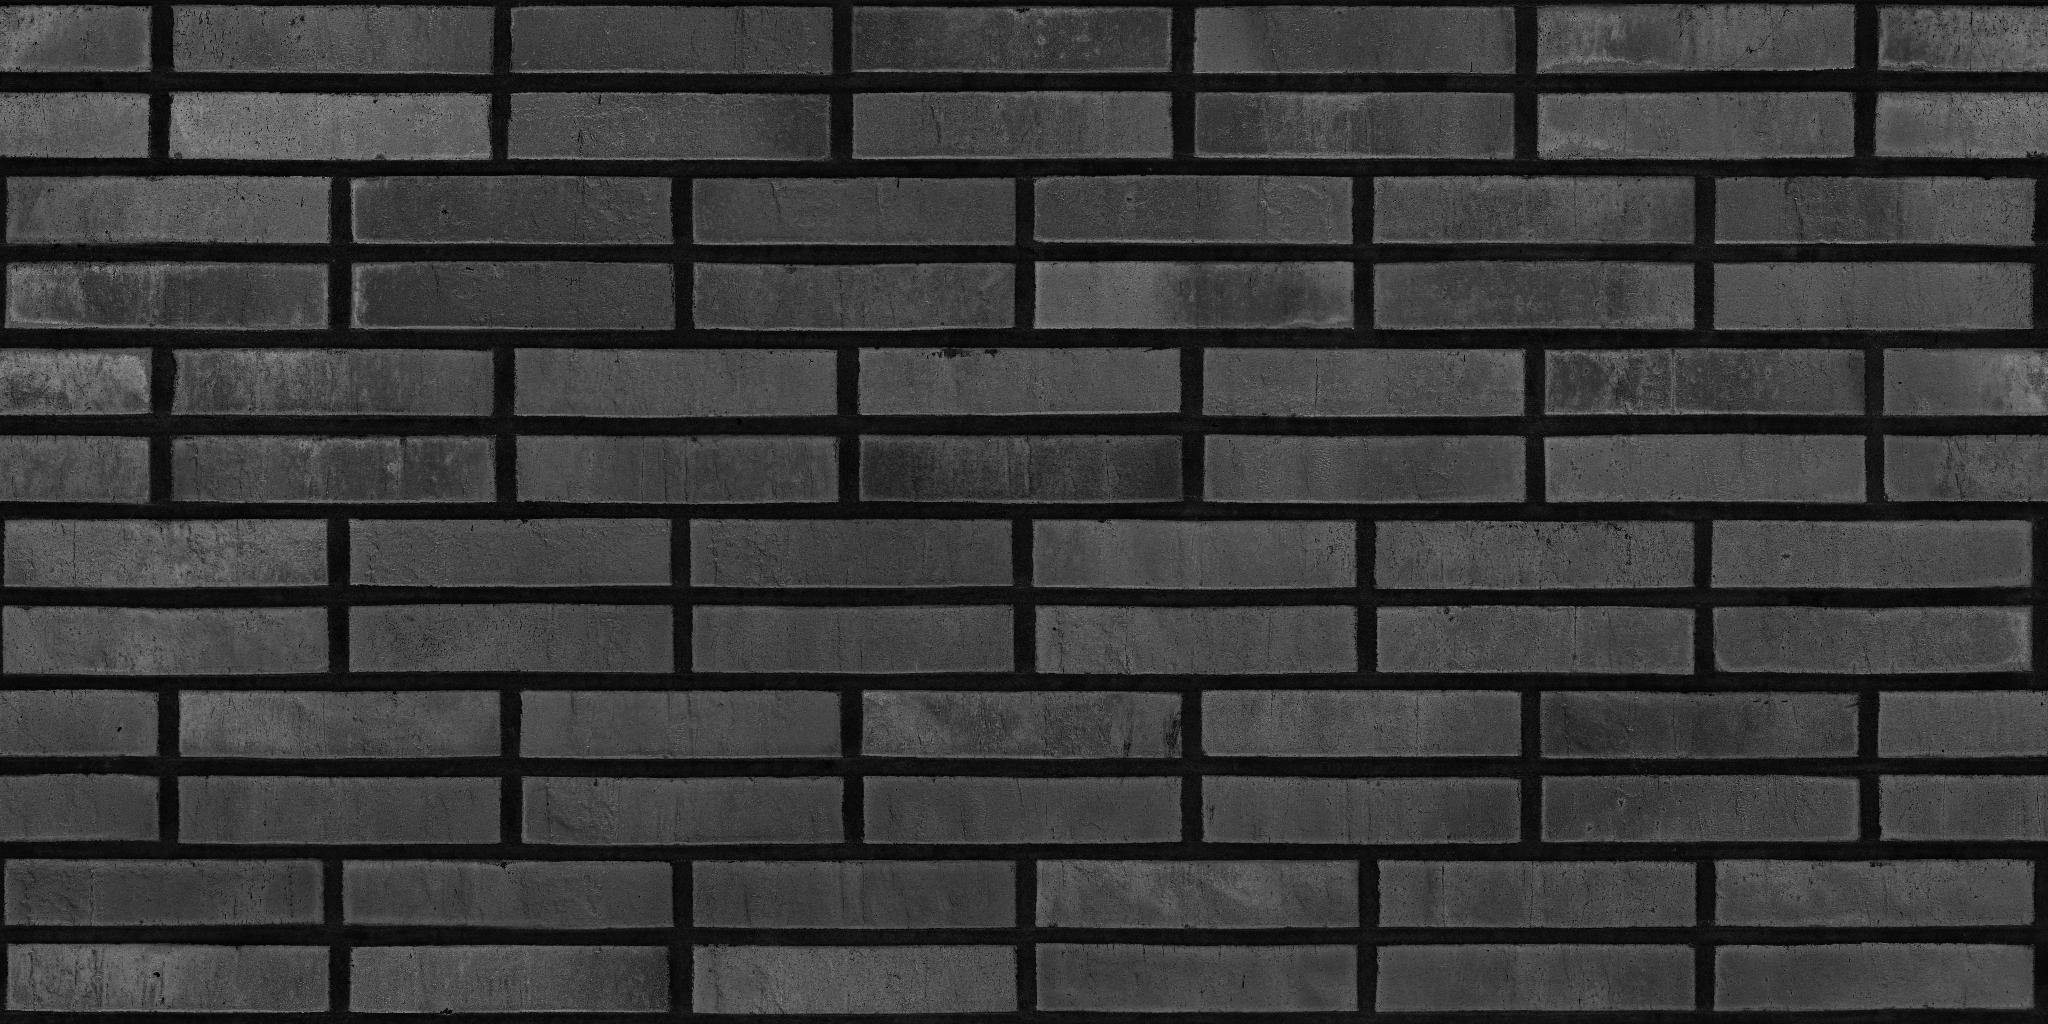 3D Scanned Seamless Brick Wall Dark Specular Map